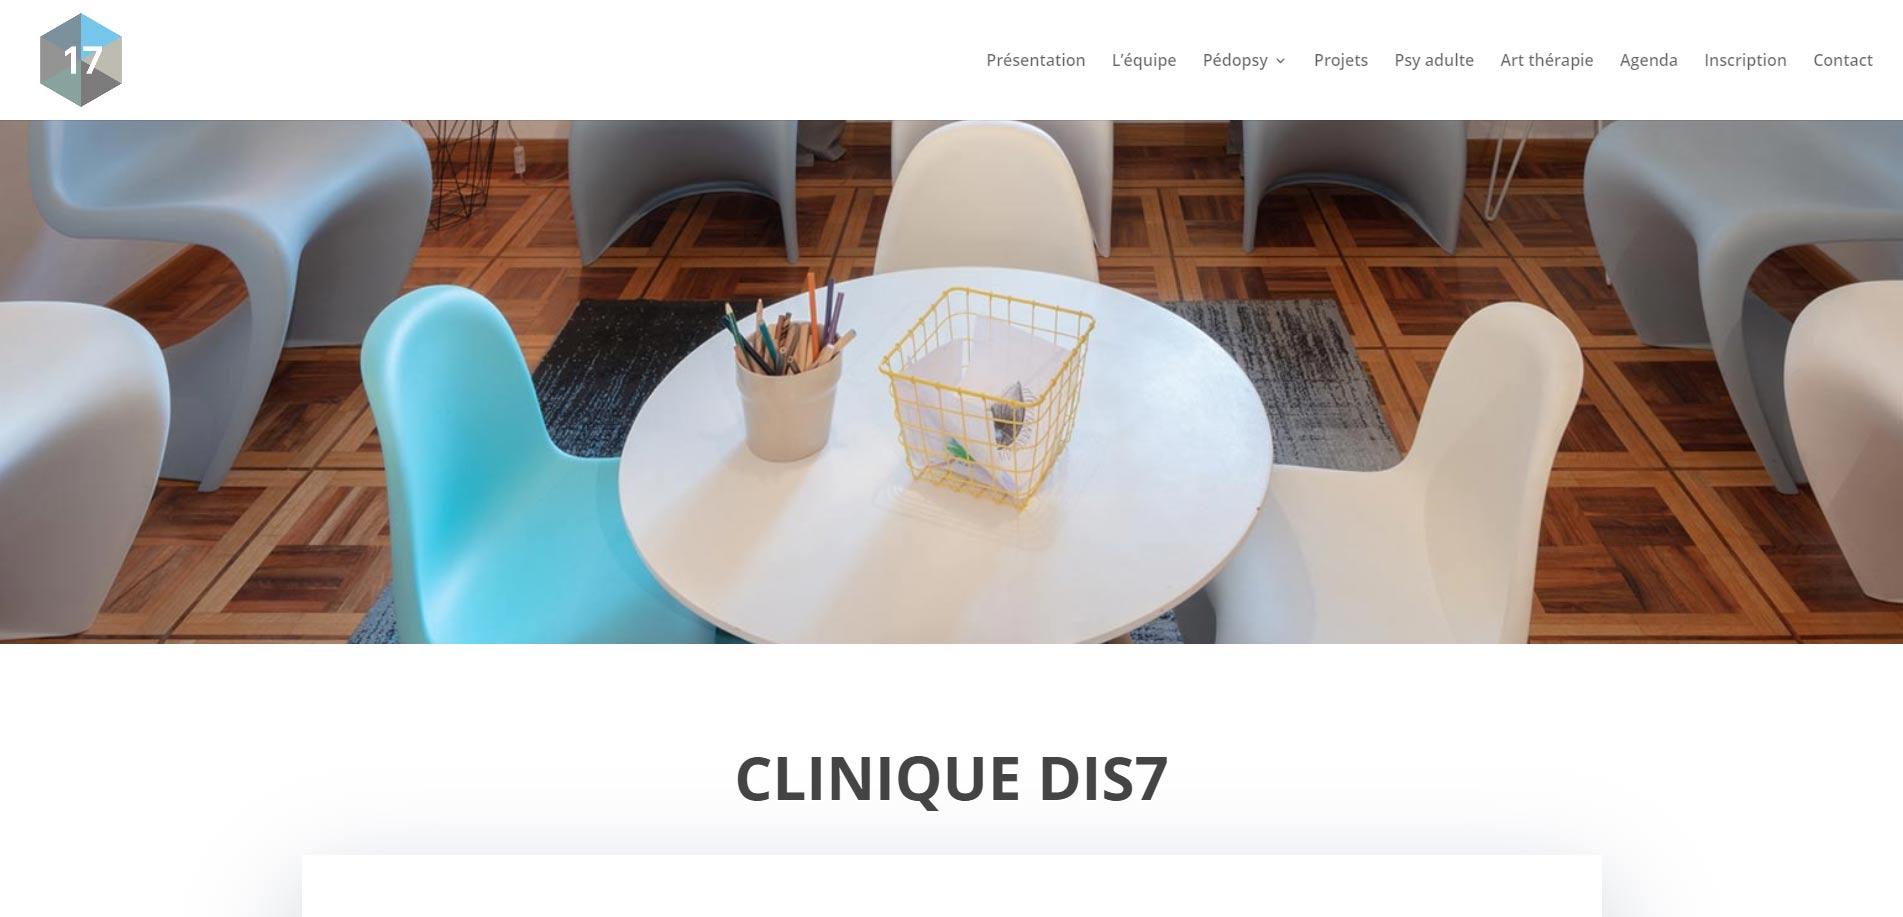 Dis7 website